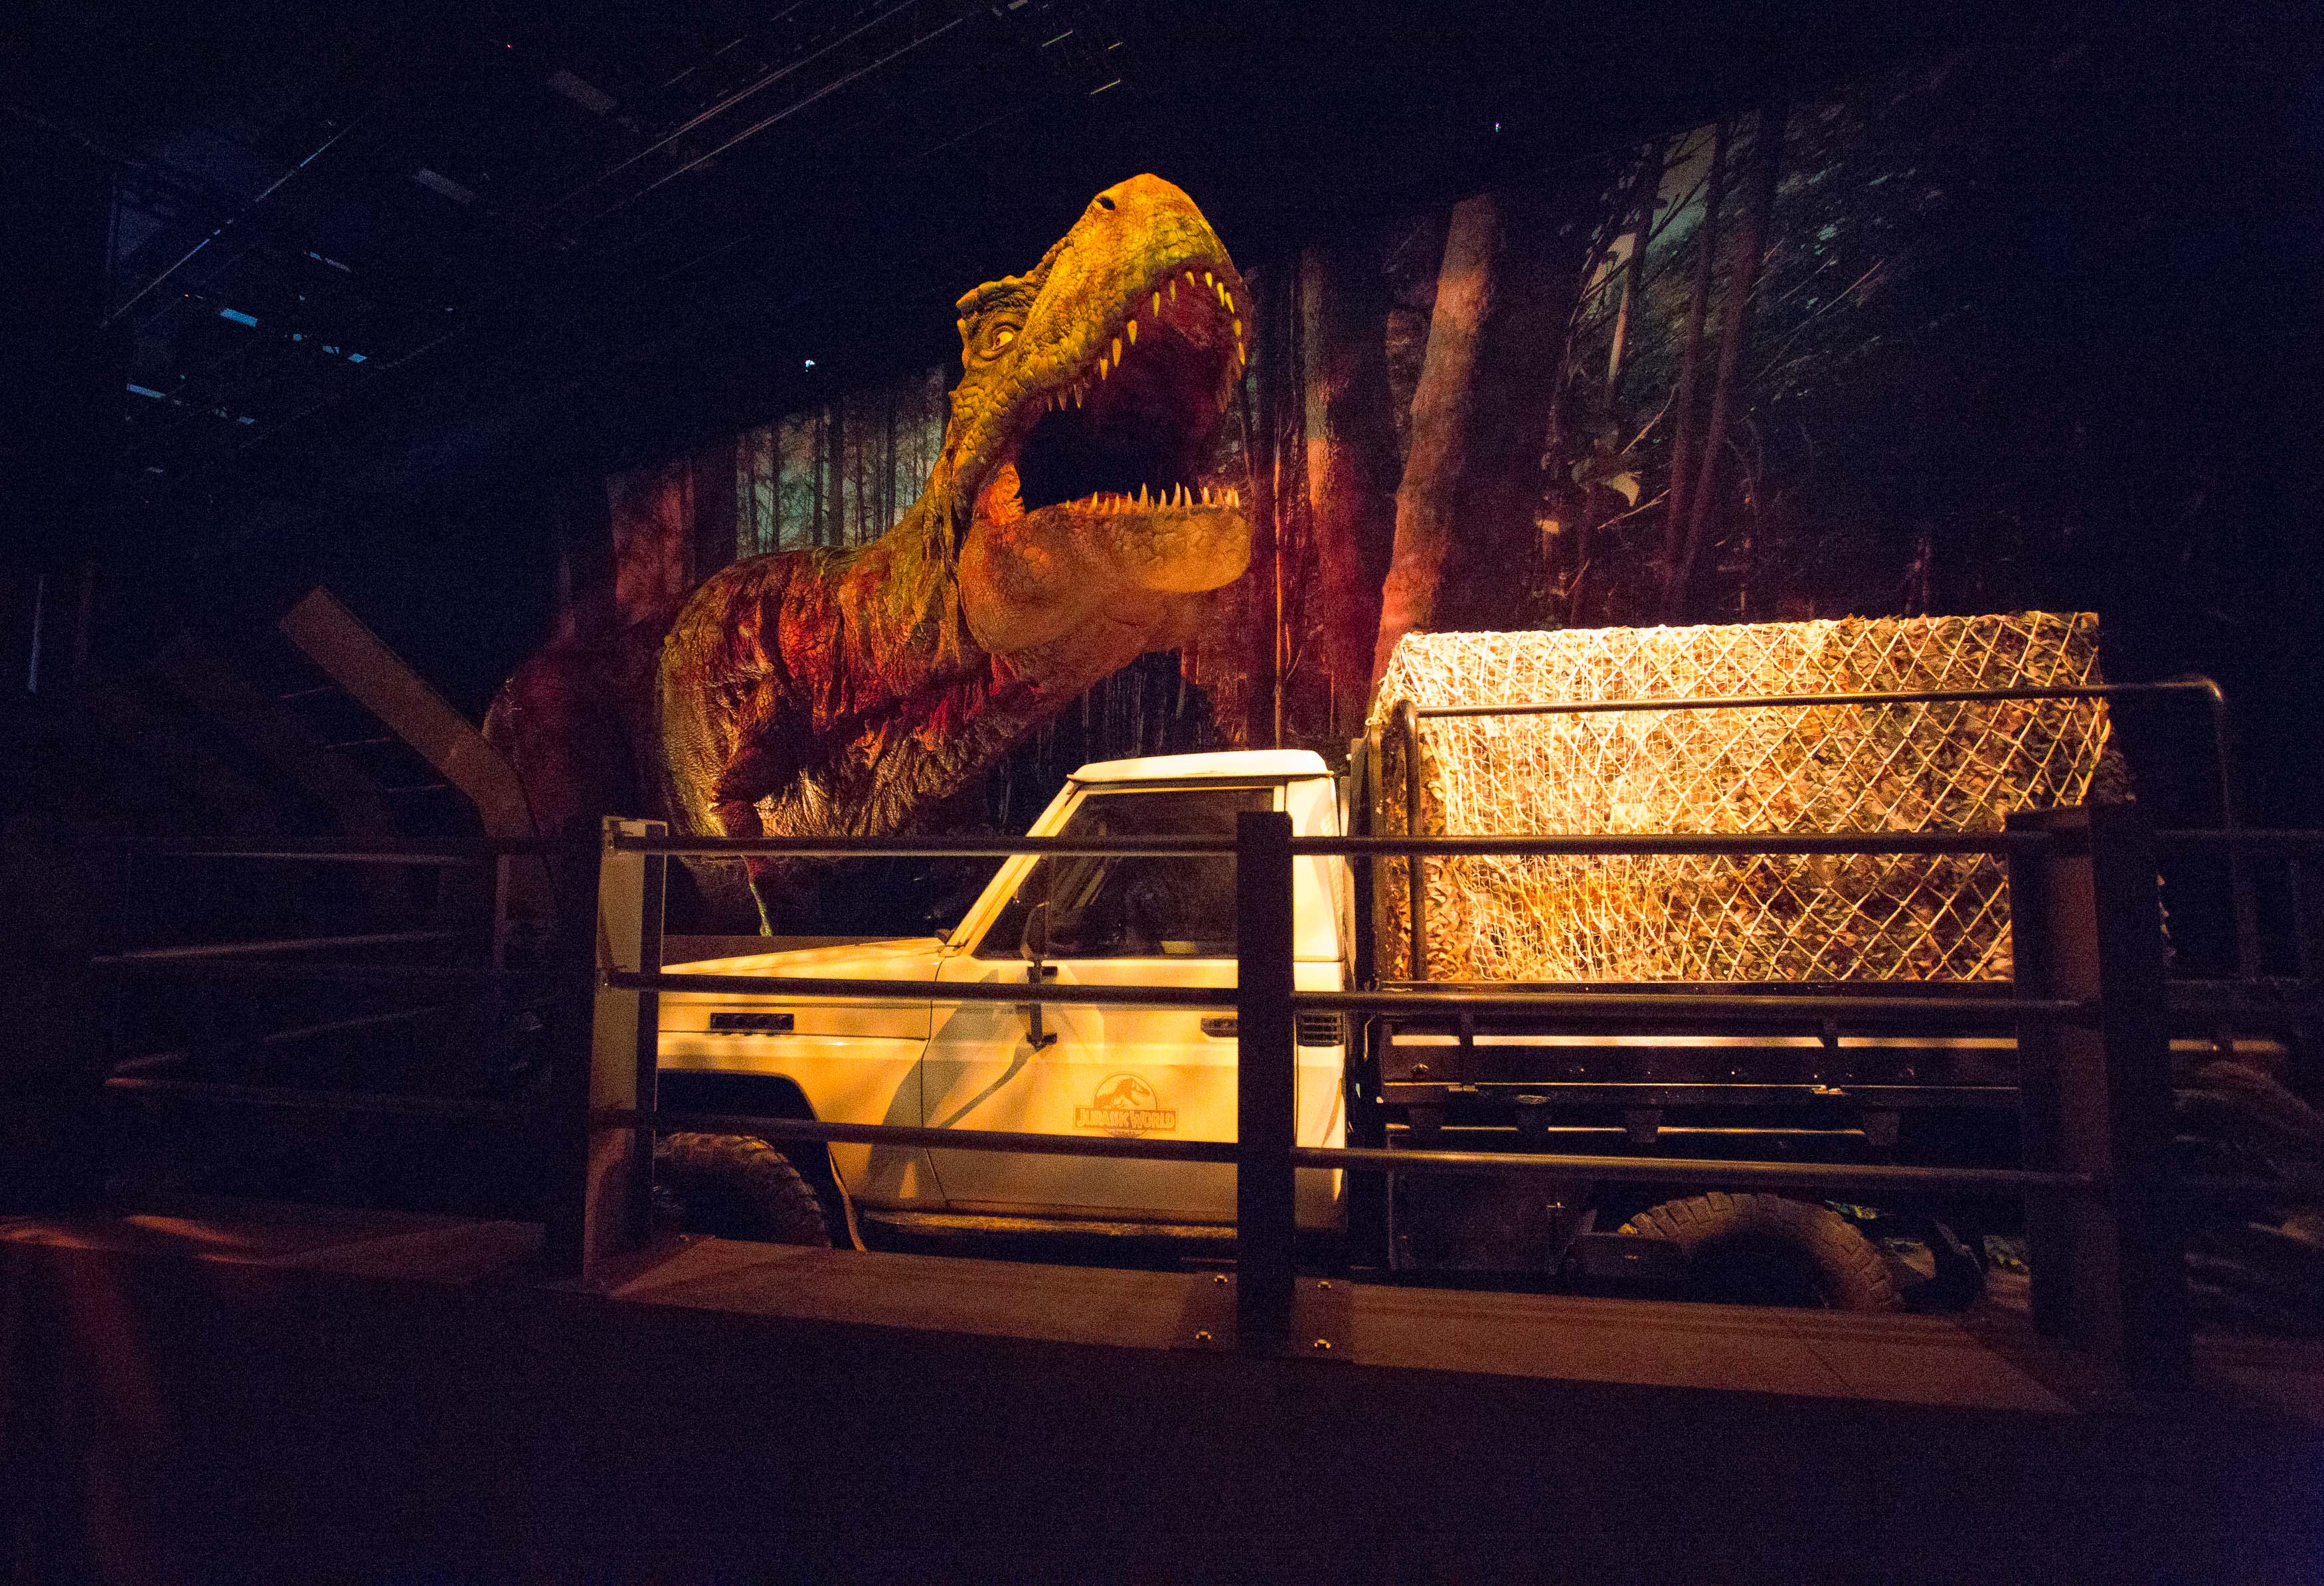 Exhibition:  Jurassic World: The Exhibition